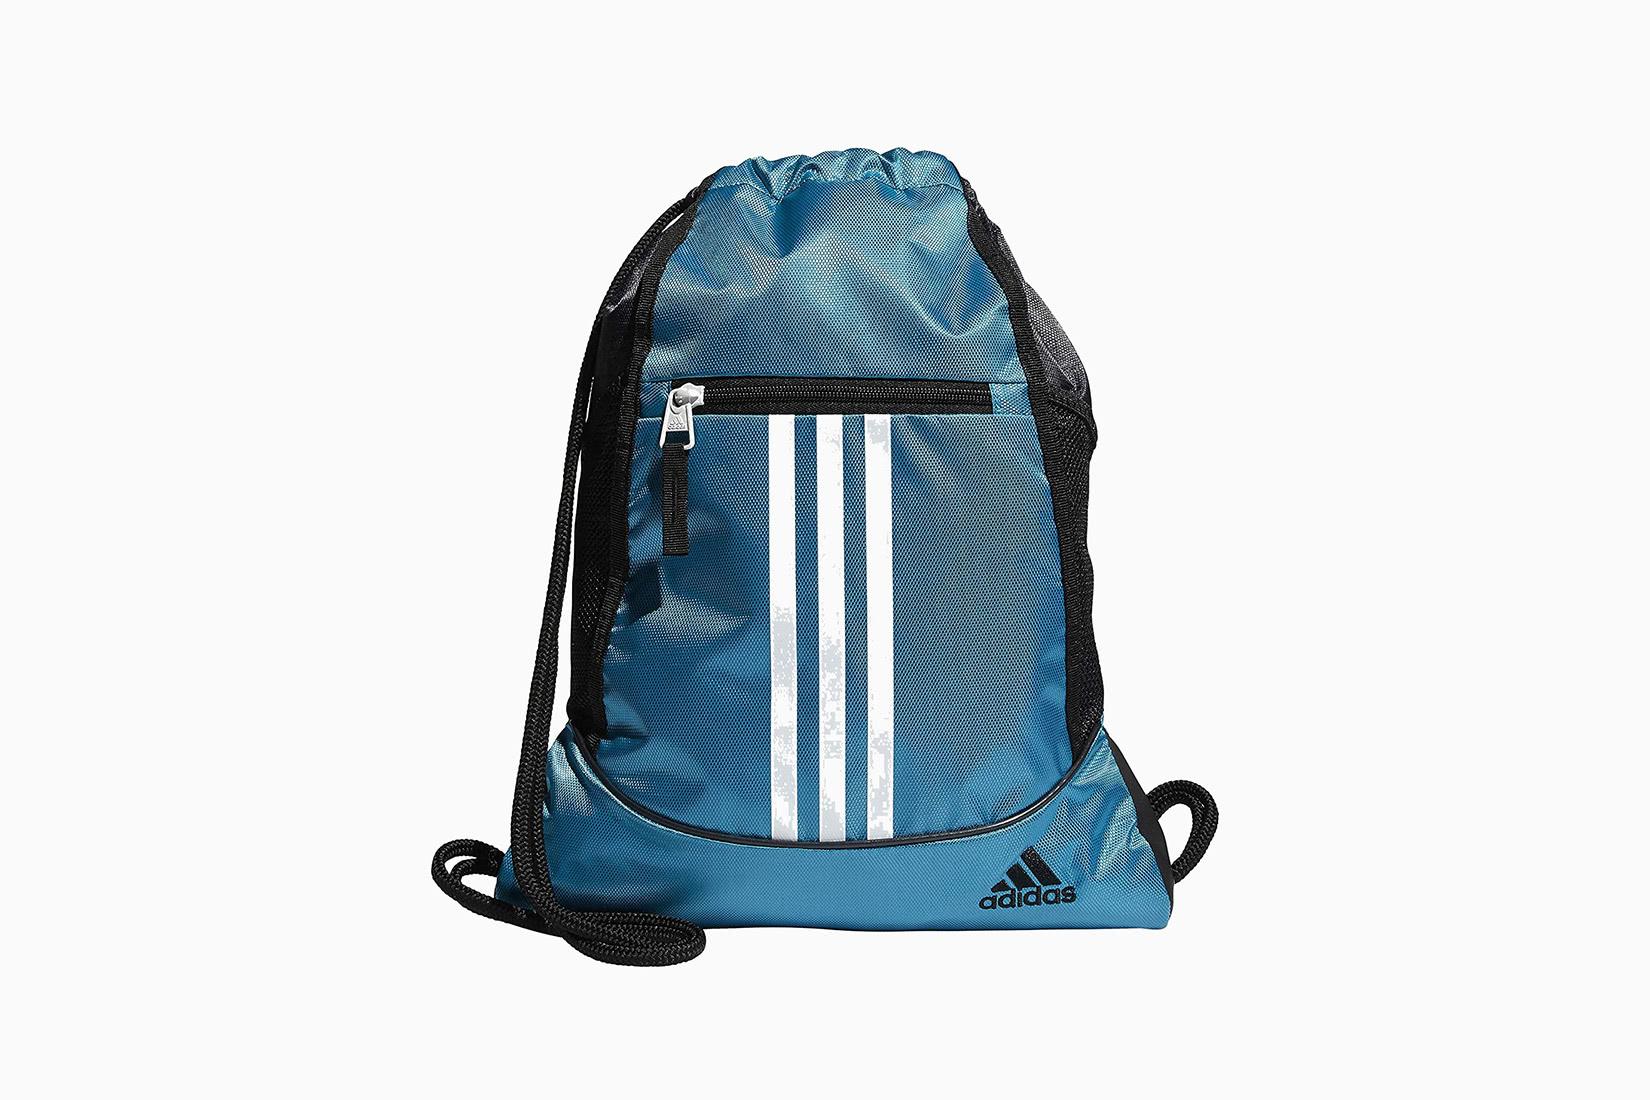 best men gym bag school adidas alliance II - Luxe Digital